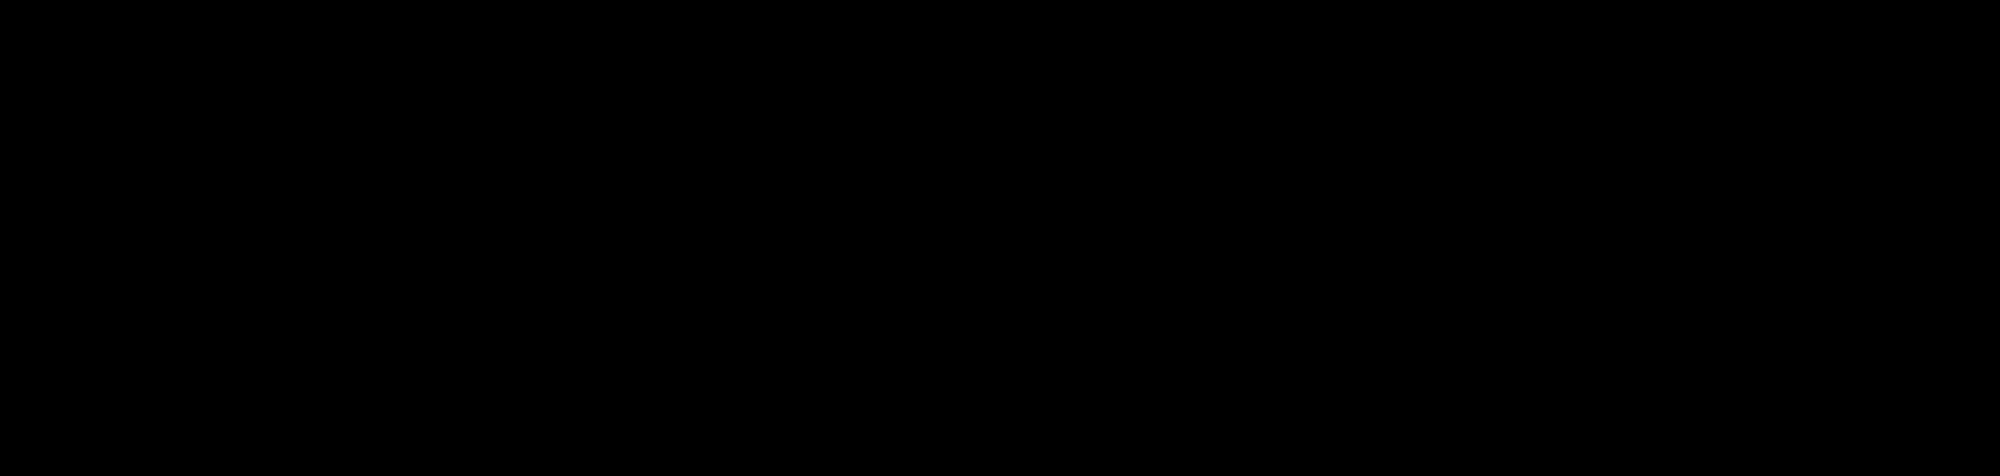 Shure_Logo.svg